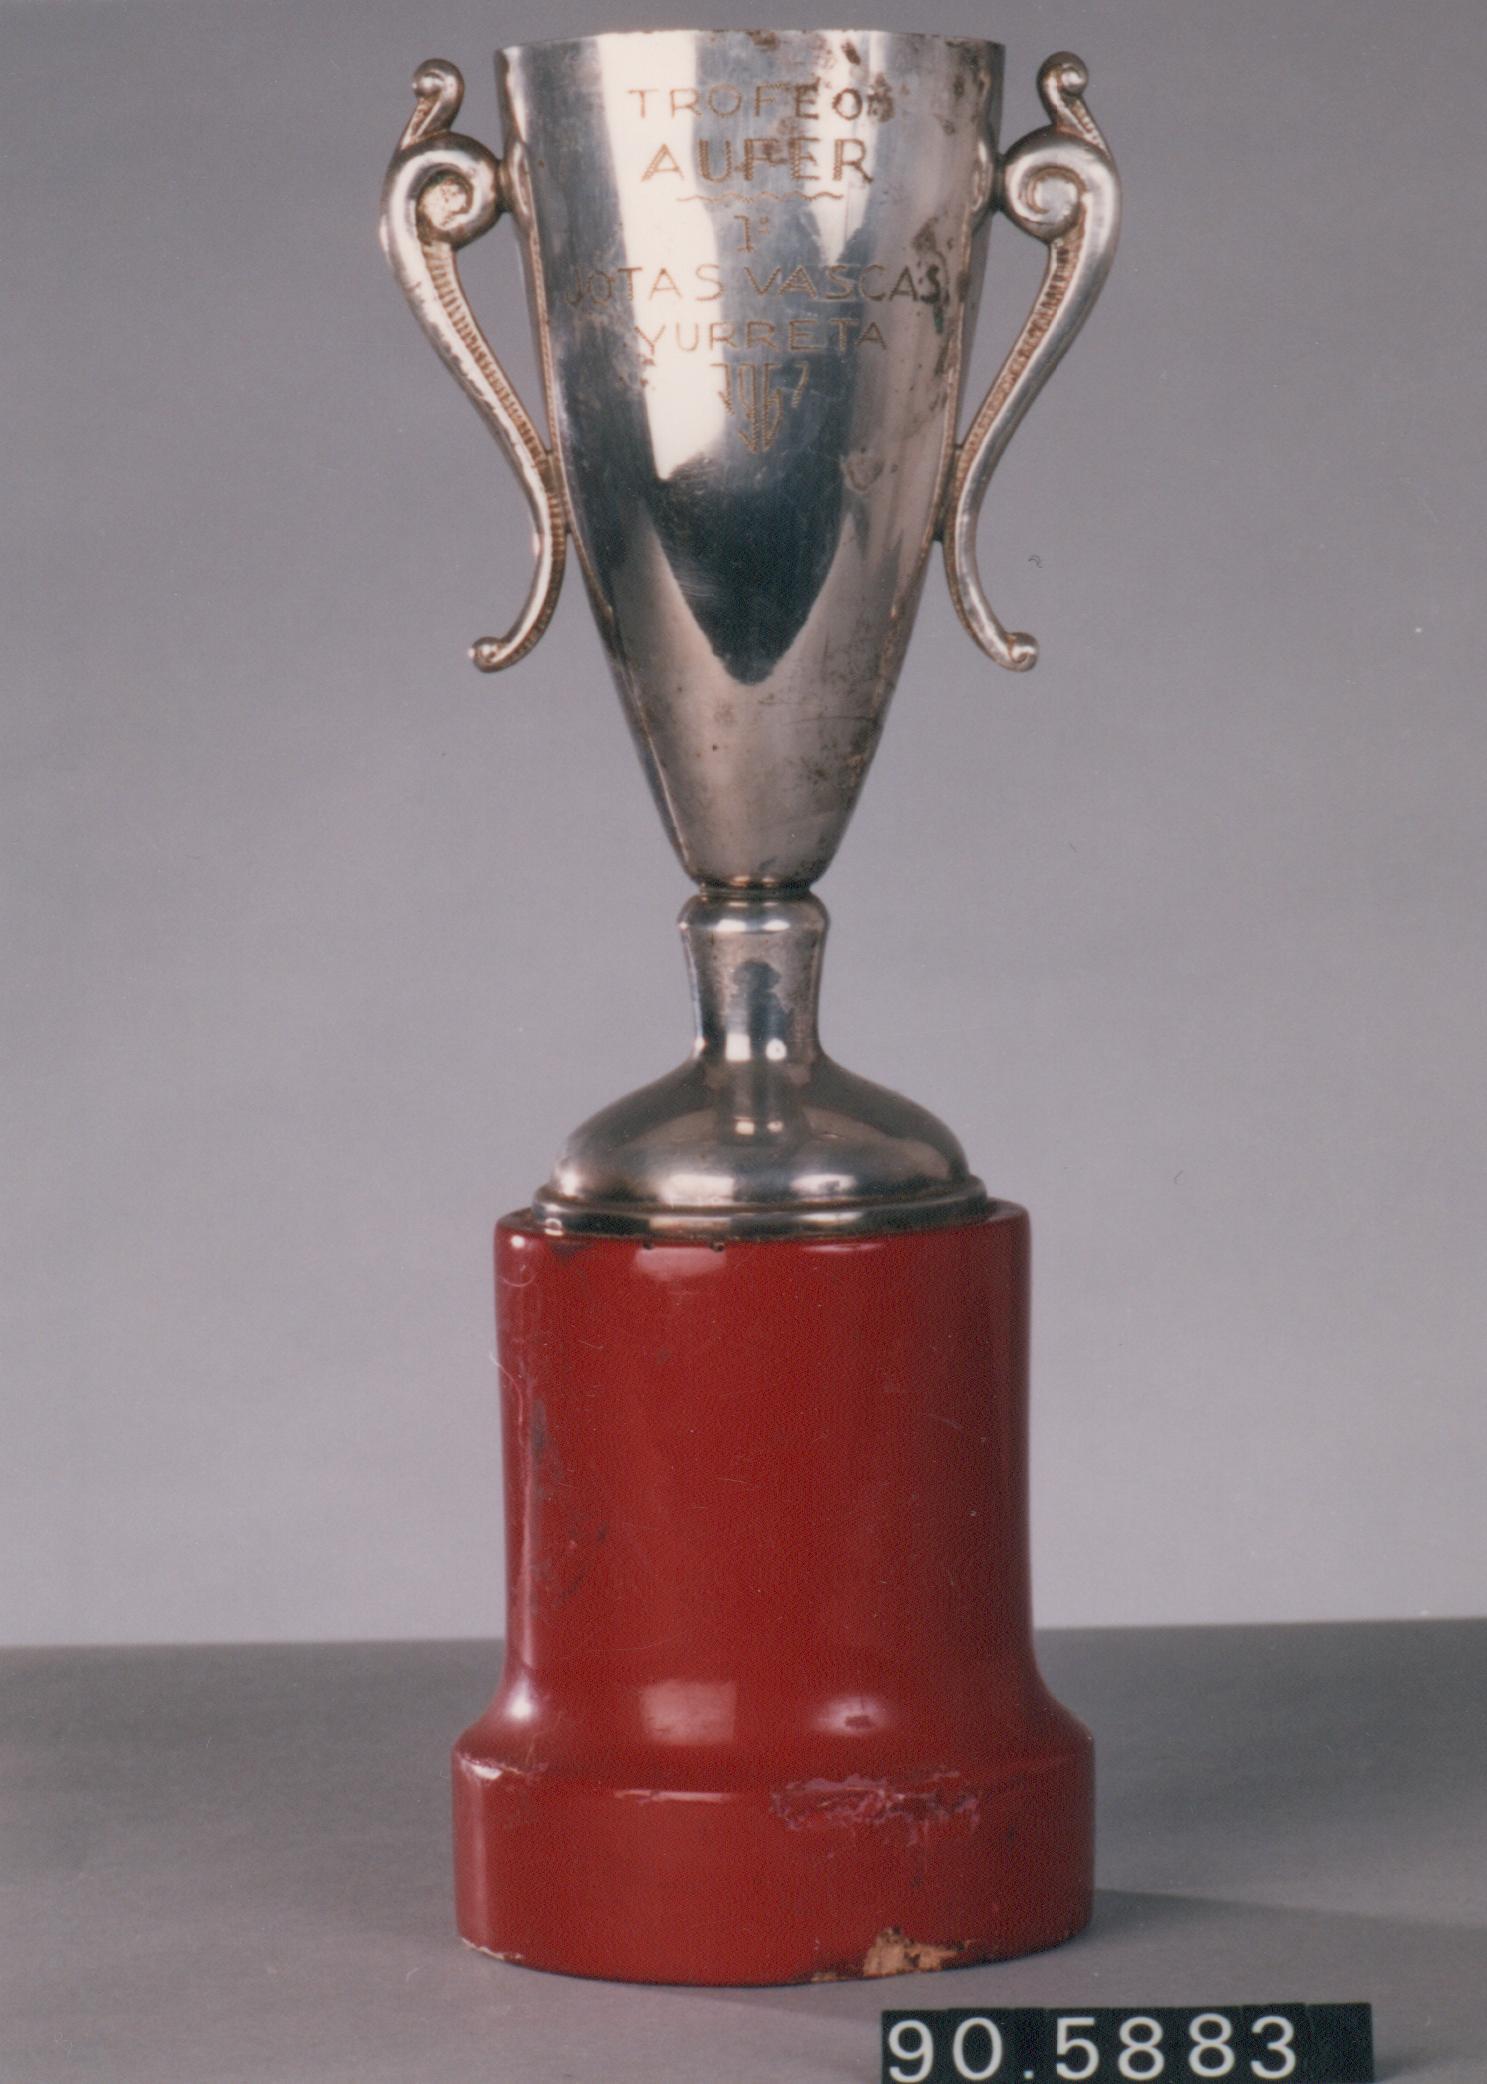 """Trofeo Aufer. 1º Jotas Vascas. Yurreta 1967"""